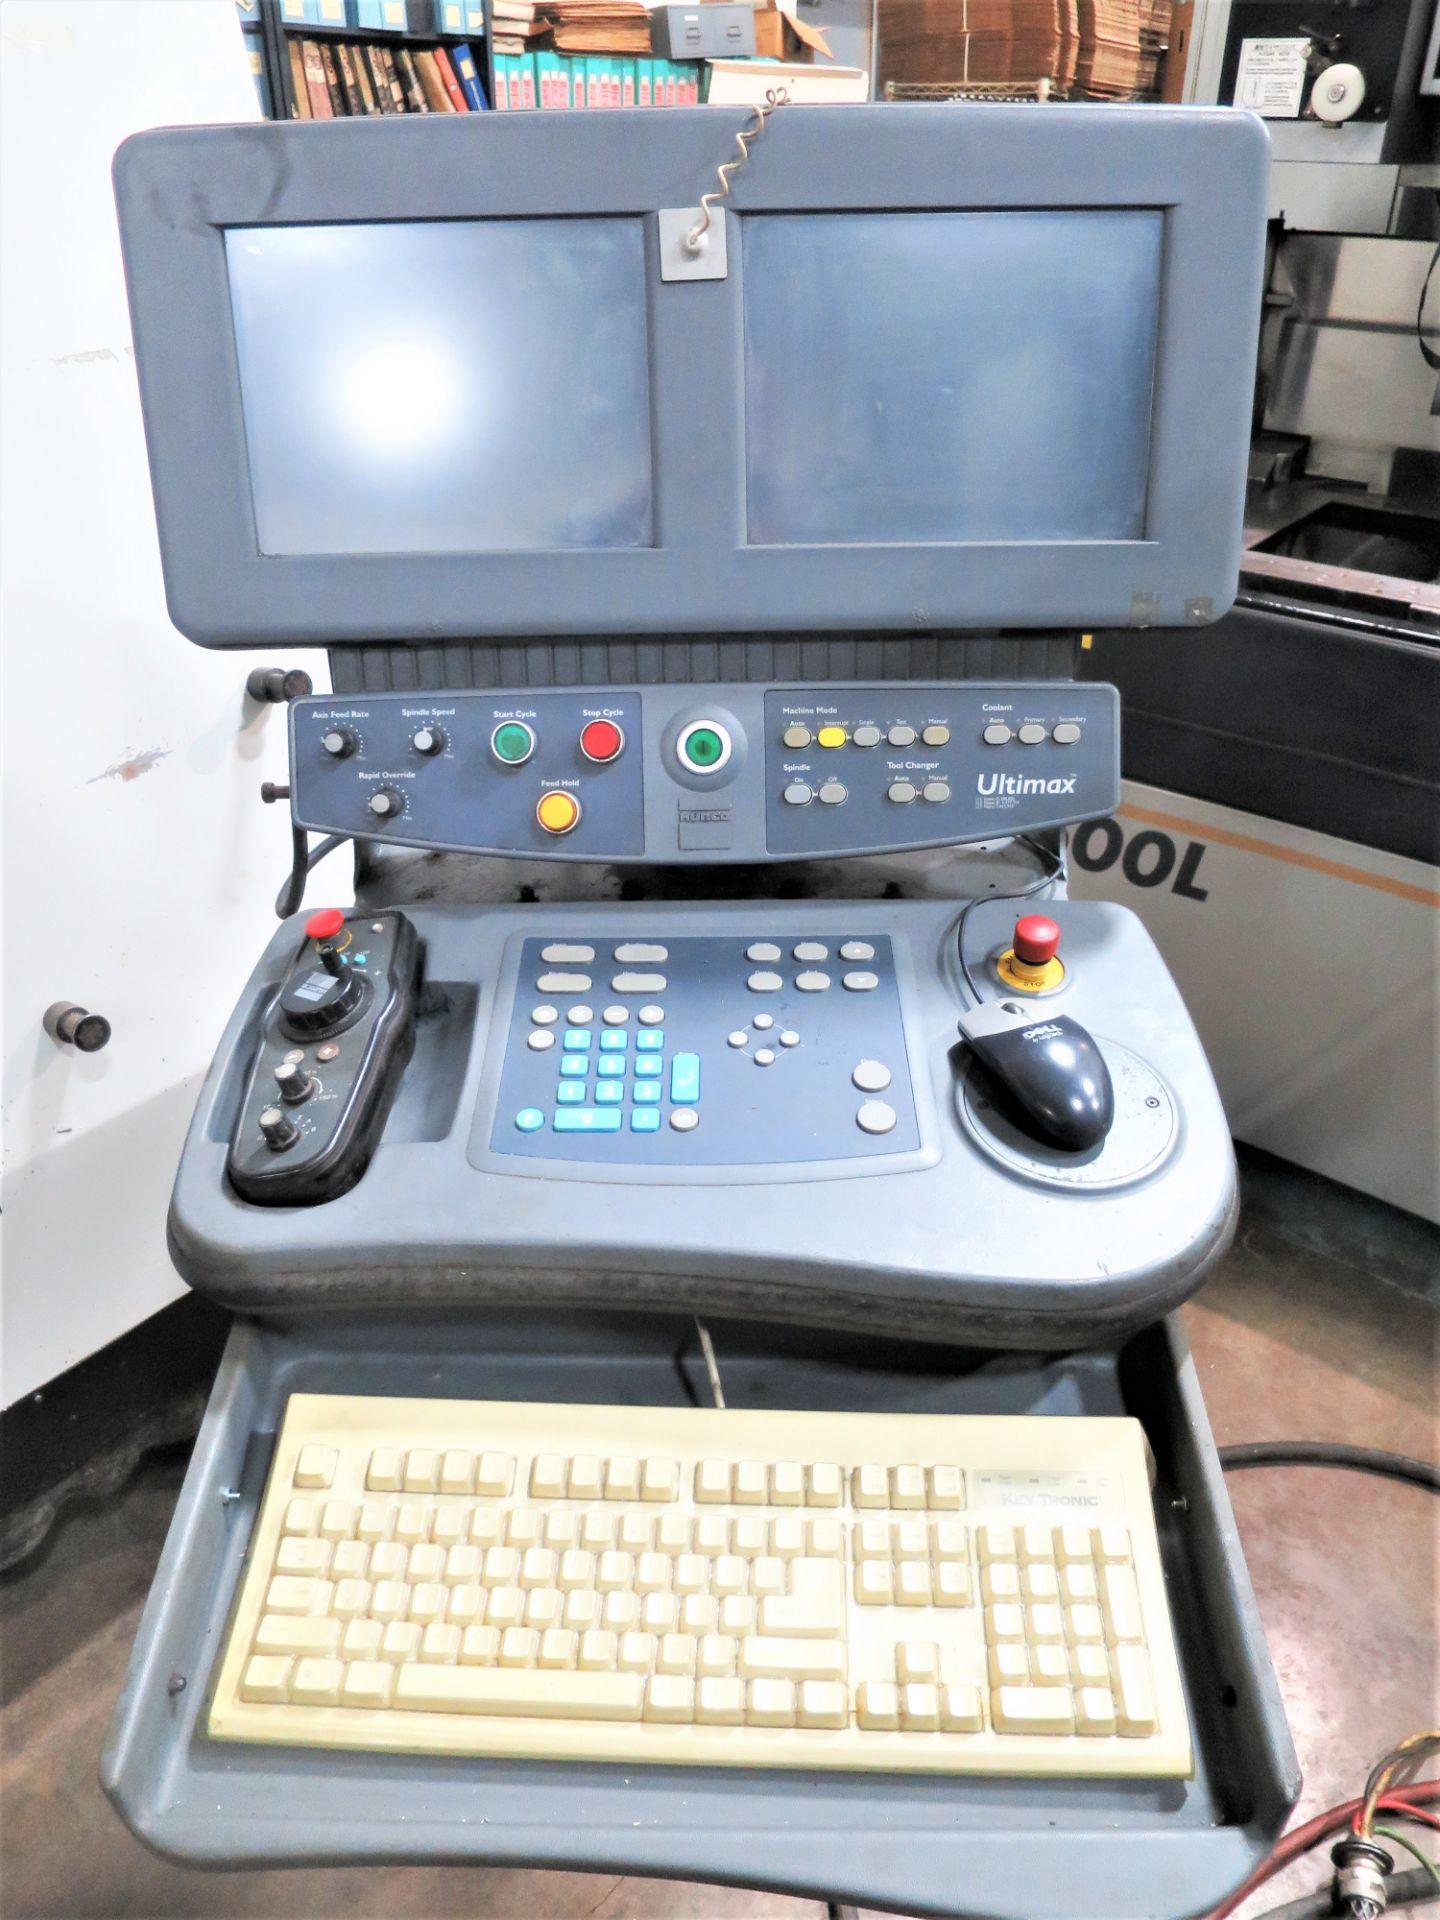 Lot 52 - Hurco VMX-24 3-Axis CNC Vertical Machining Center, S/N M242-06019, New 2007